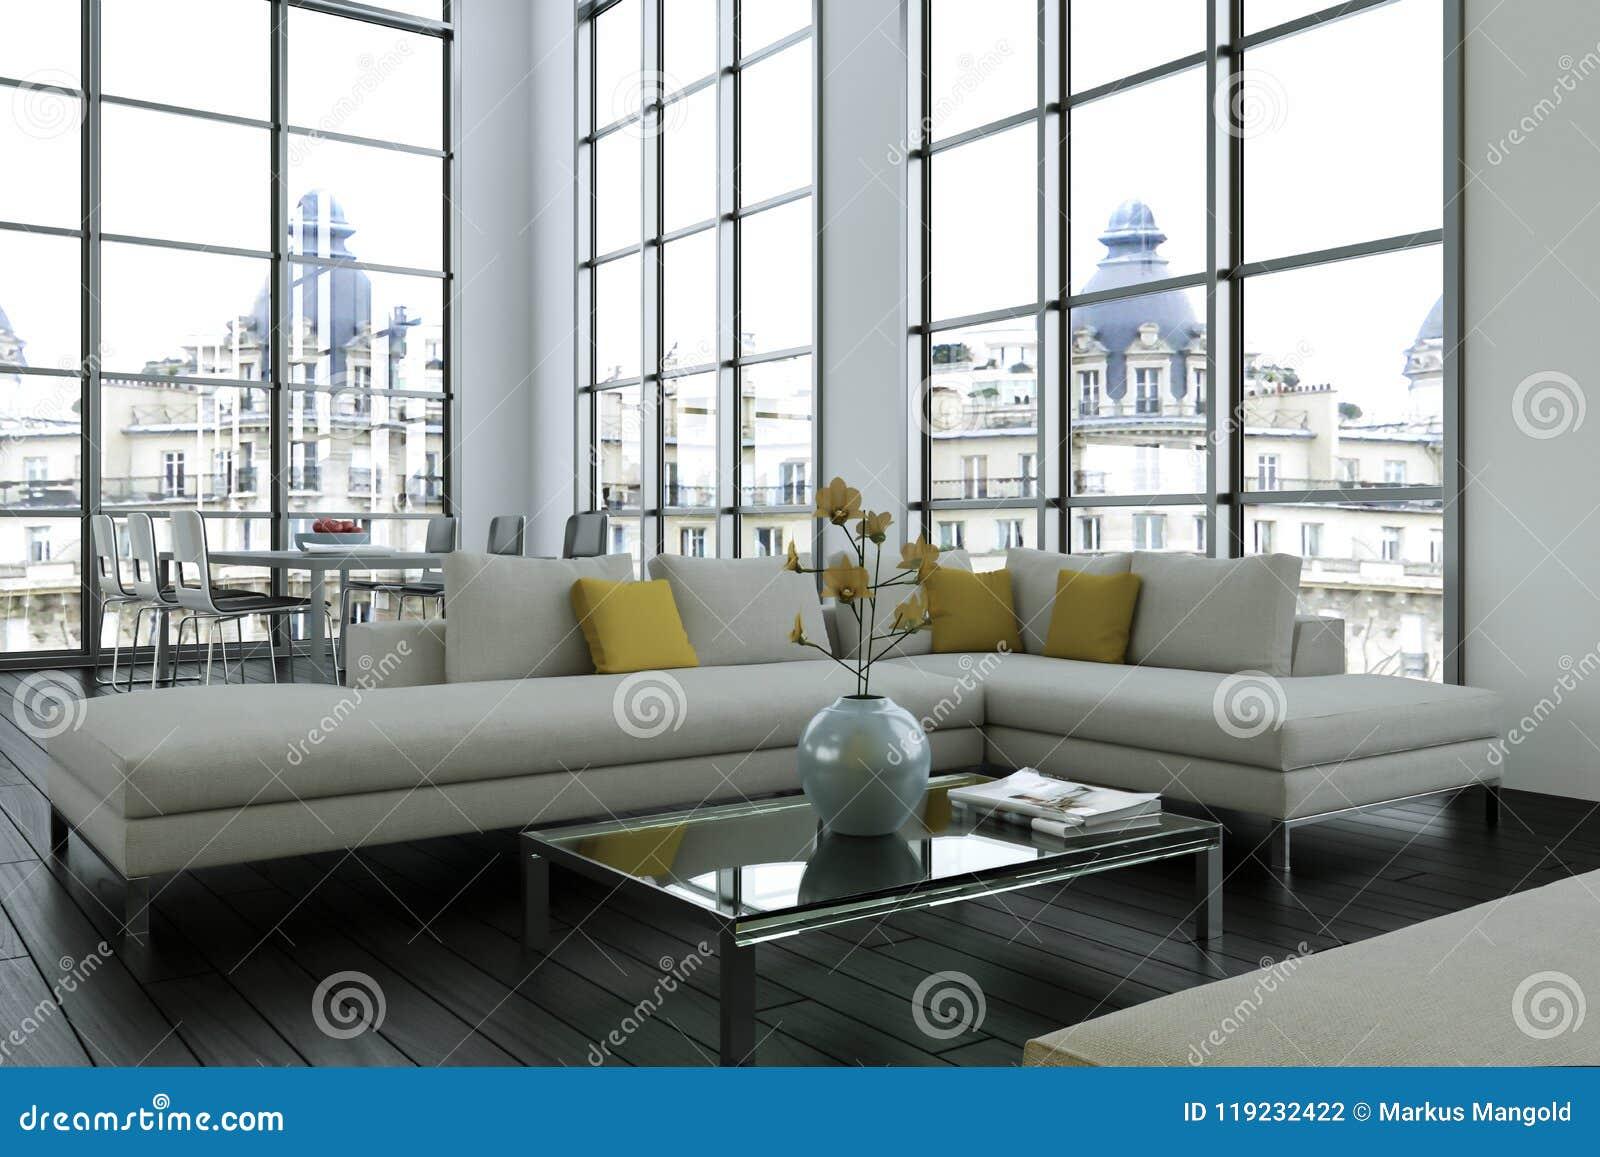 Modern Bright Loft With Big Windows Interior Design